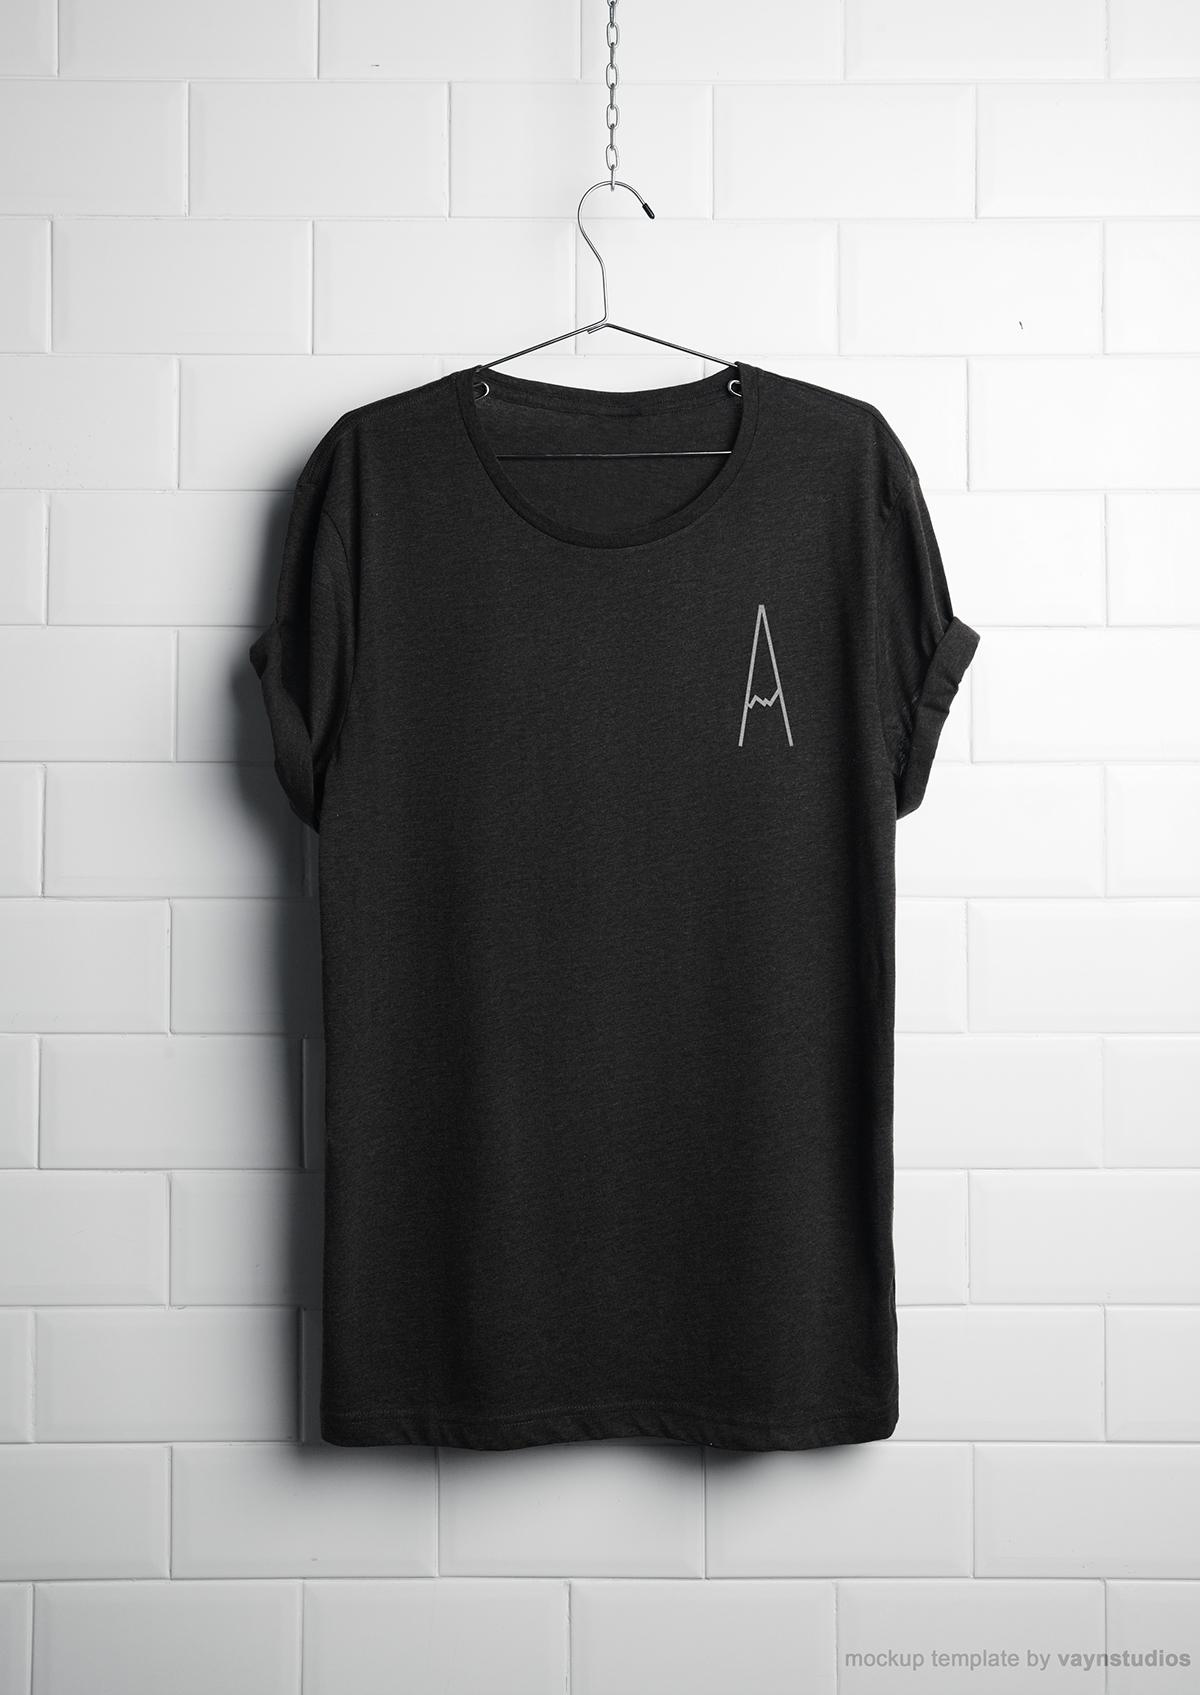 T- Shirt Design Business Cards monotype Andrew John Design brighton